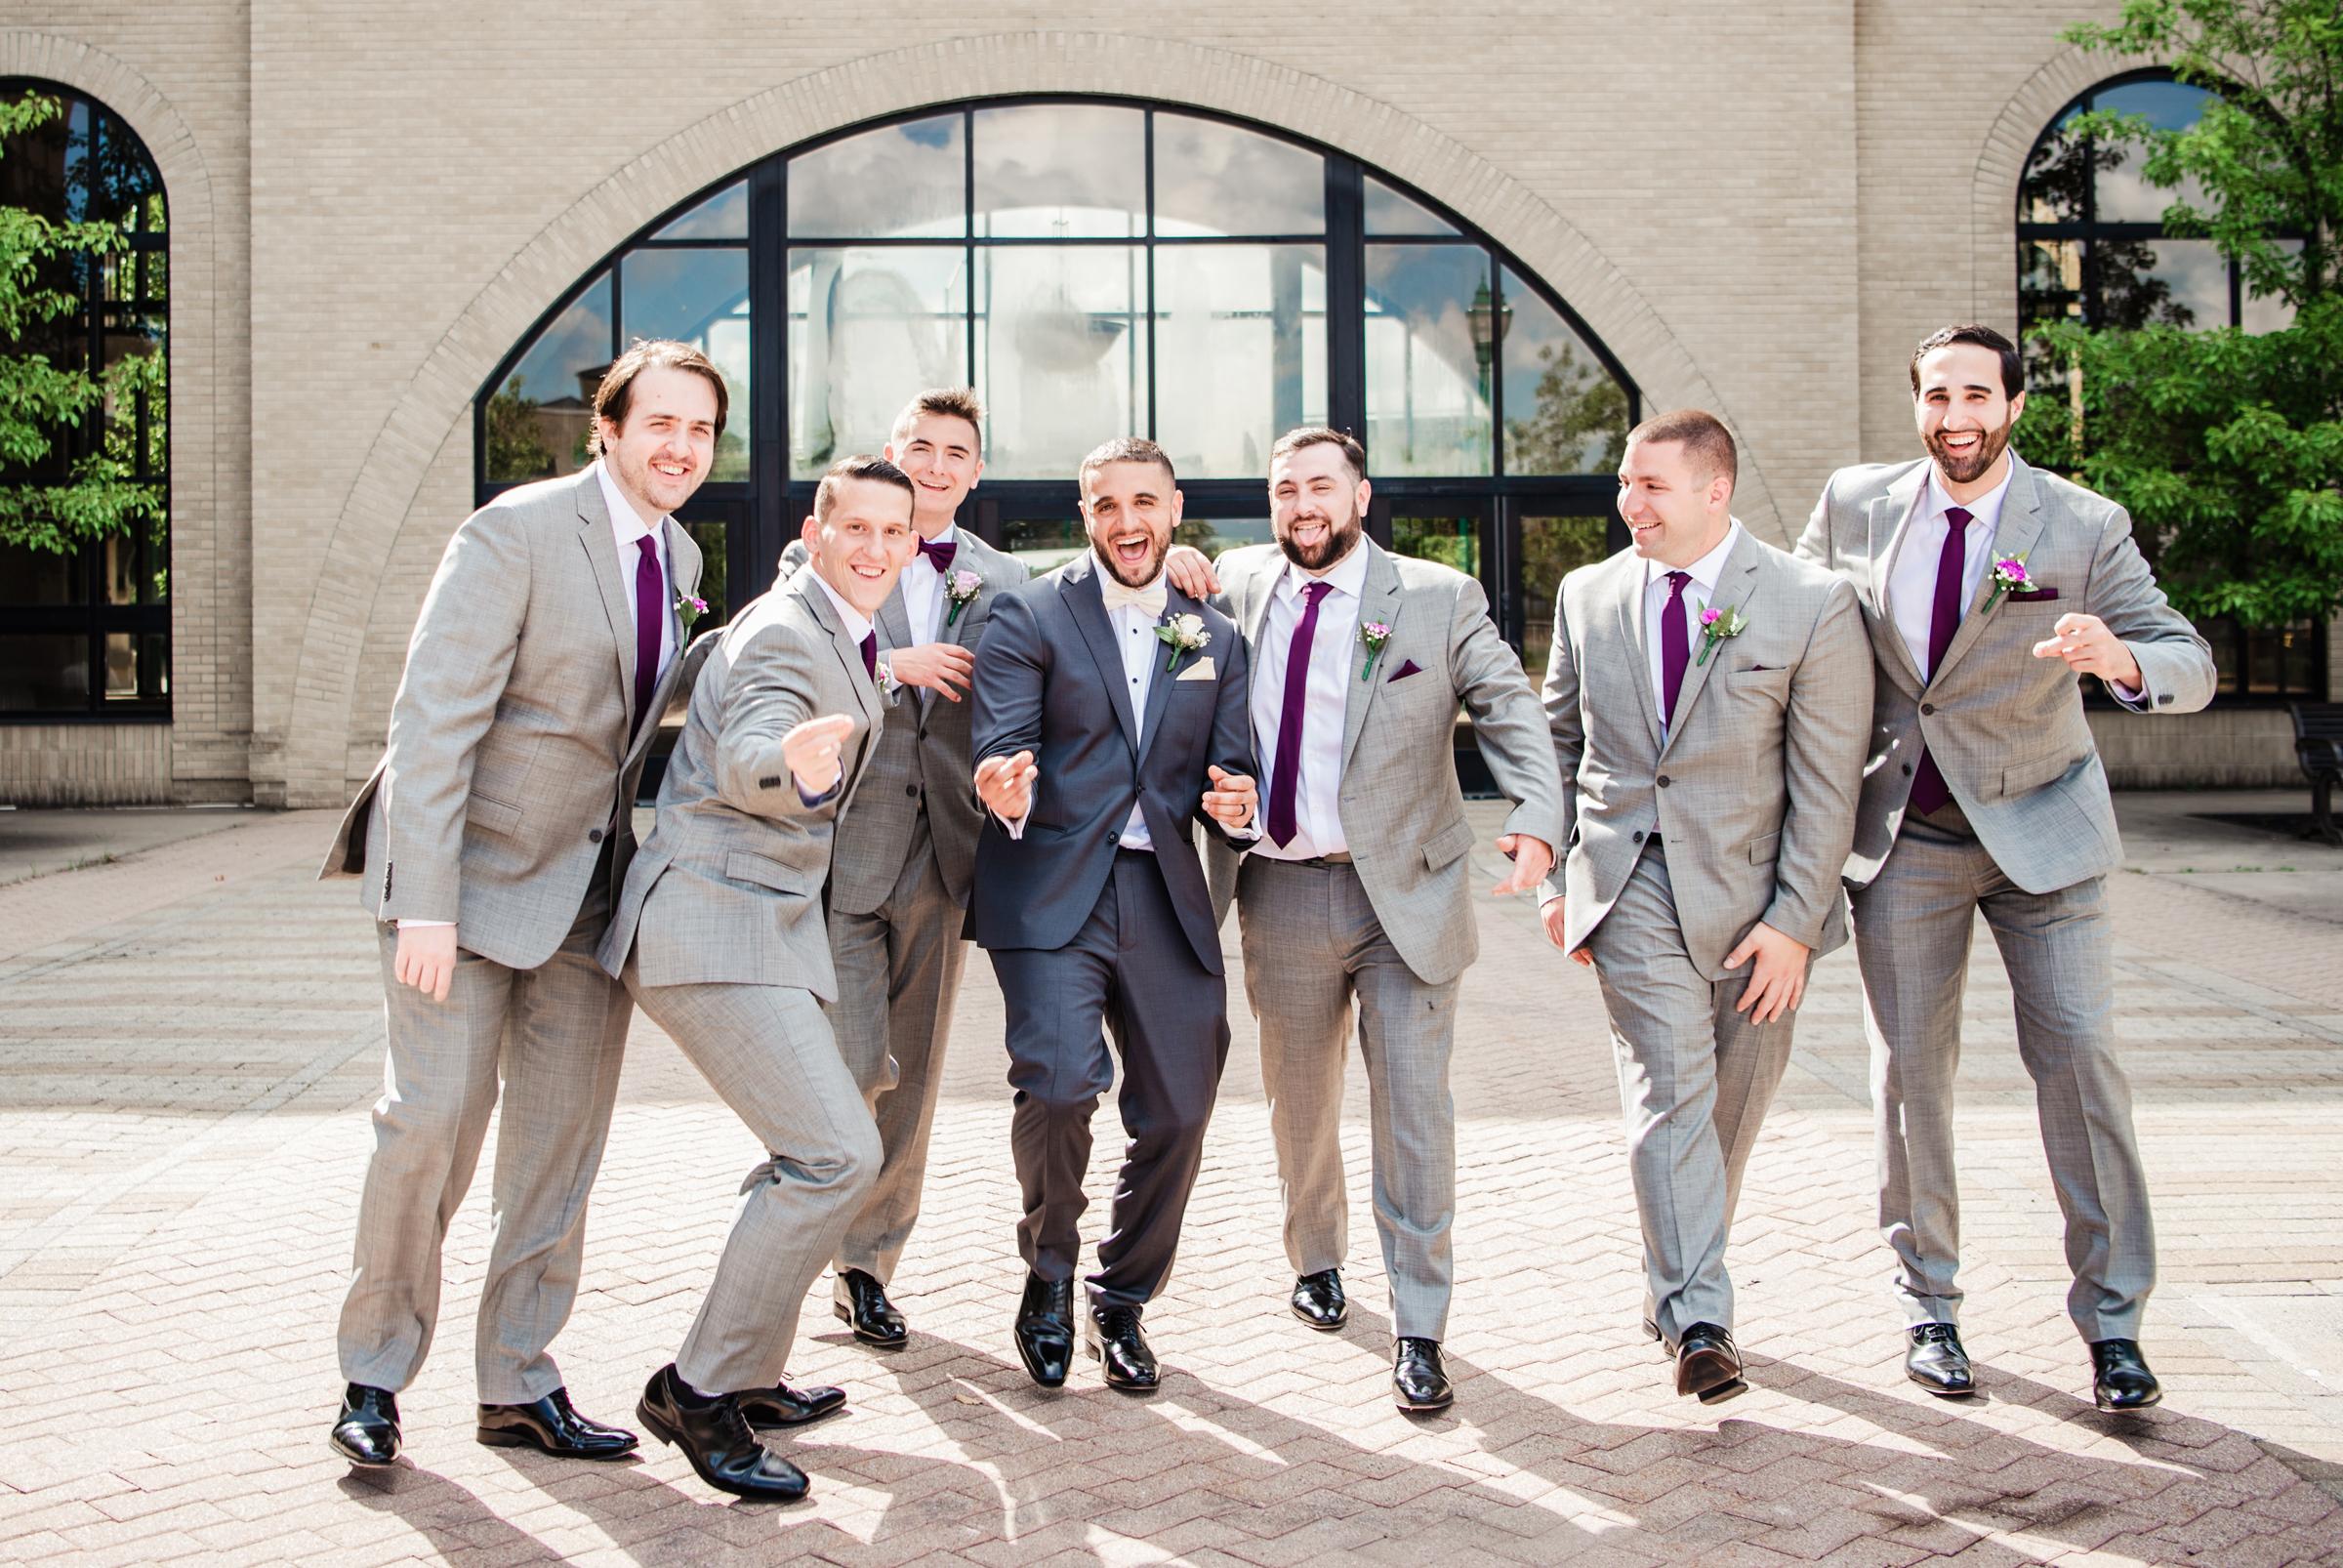 Historic_Old_St_Johns_Church_Valentinos_Banquet_Hall_Central_NY_Wedding_JILL_STUDIO_Rochester_NY_Photographer_DSC_6328.jpg